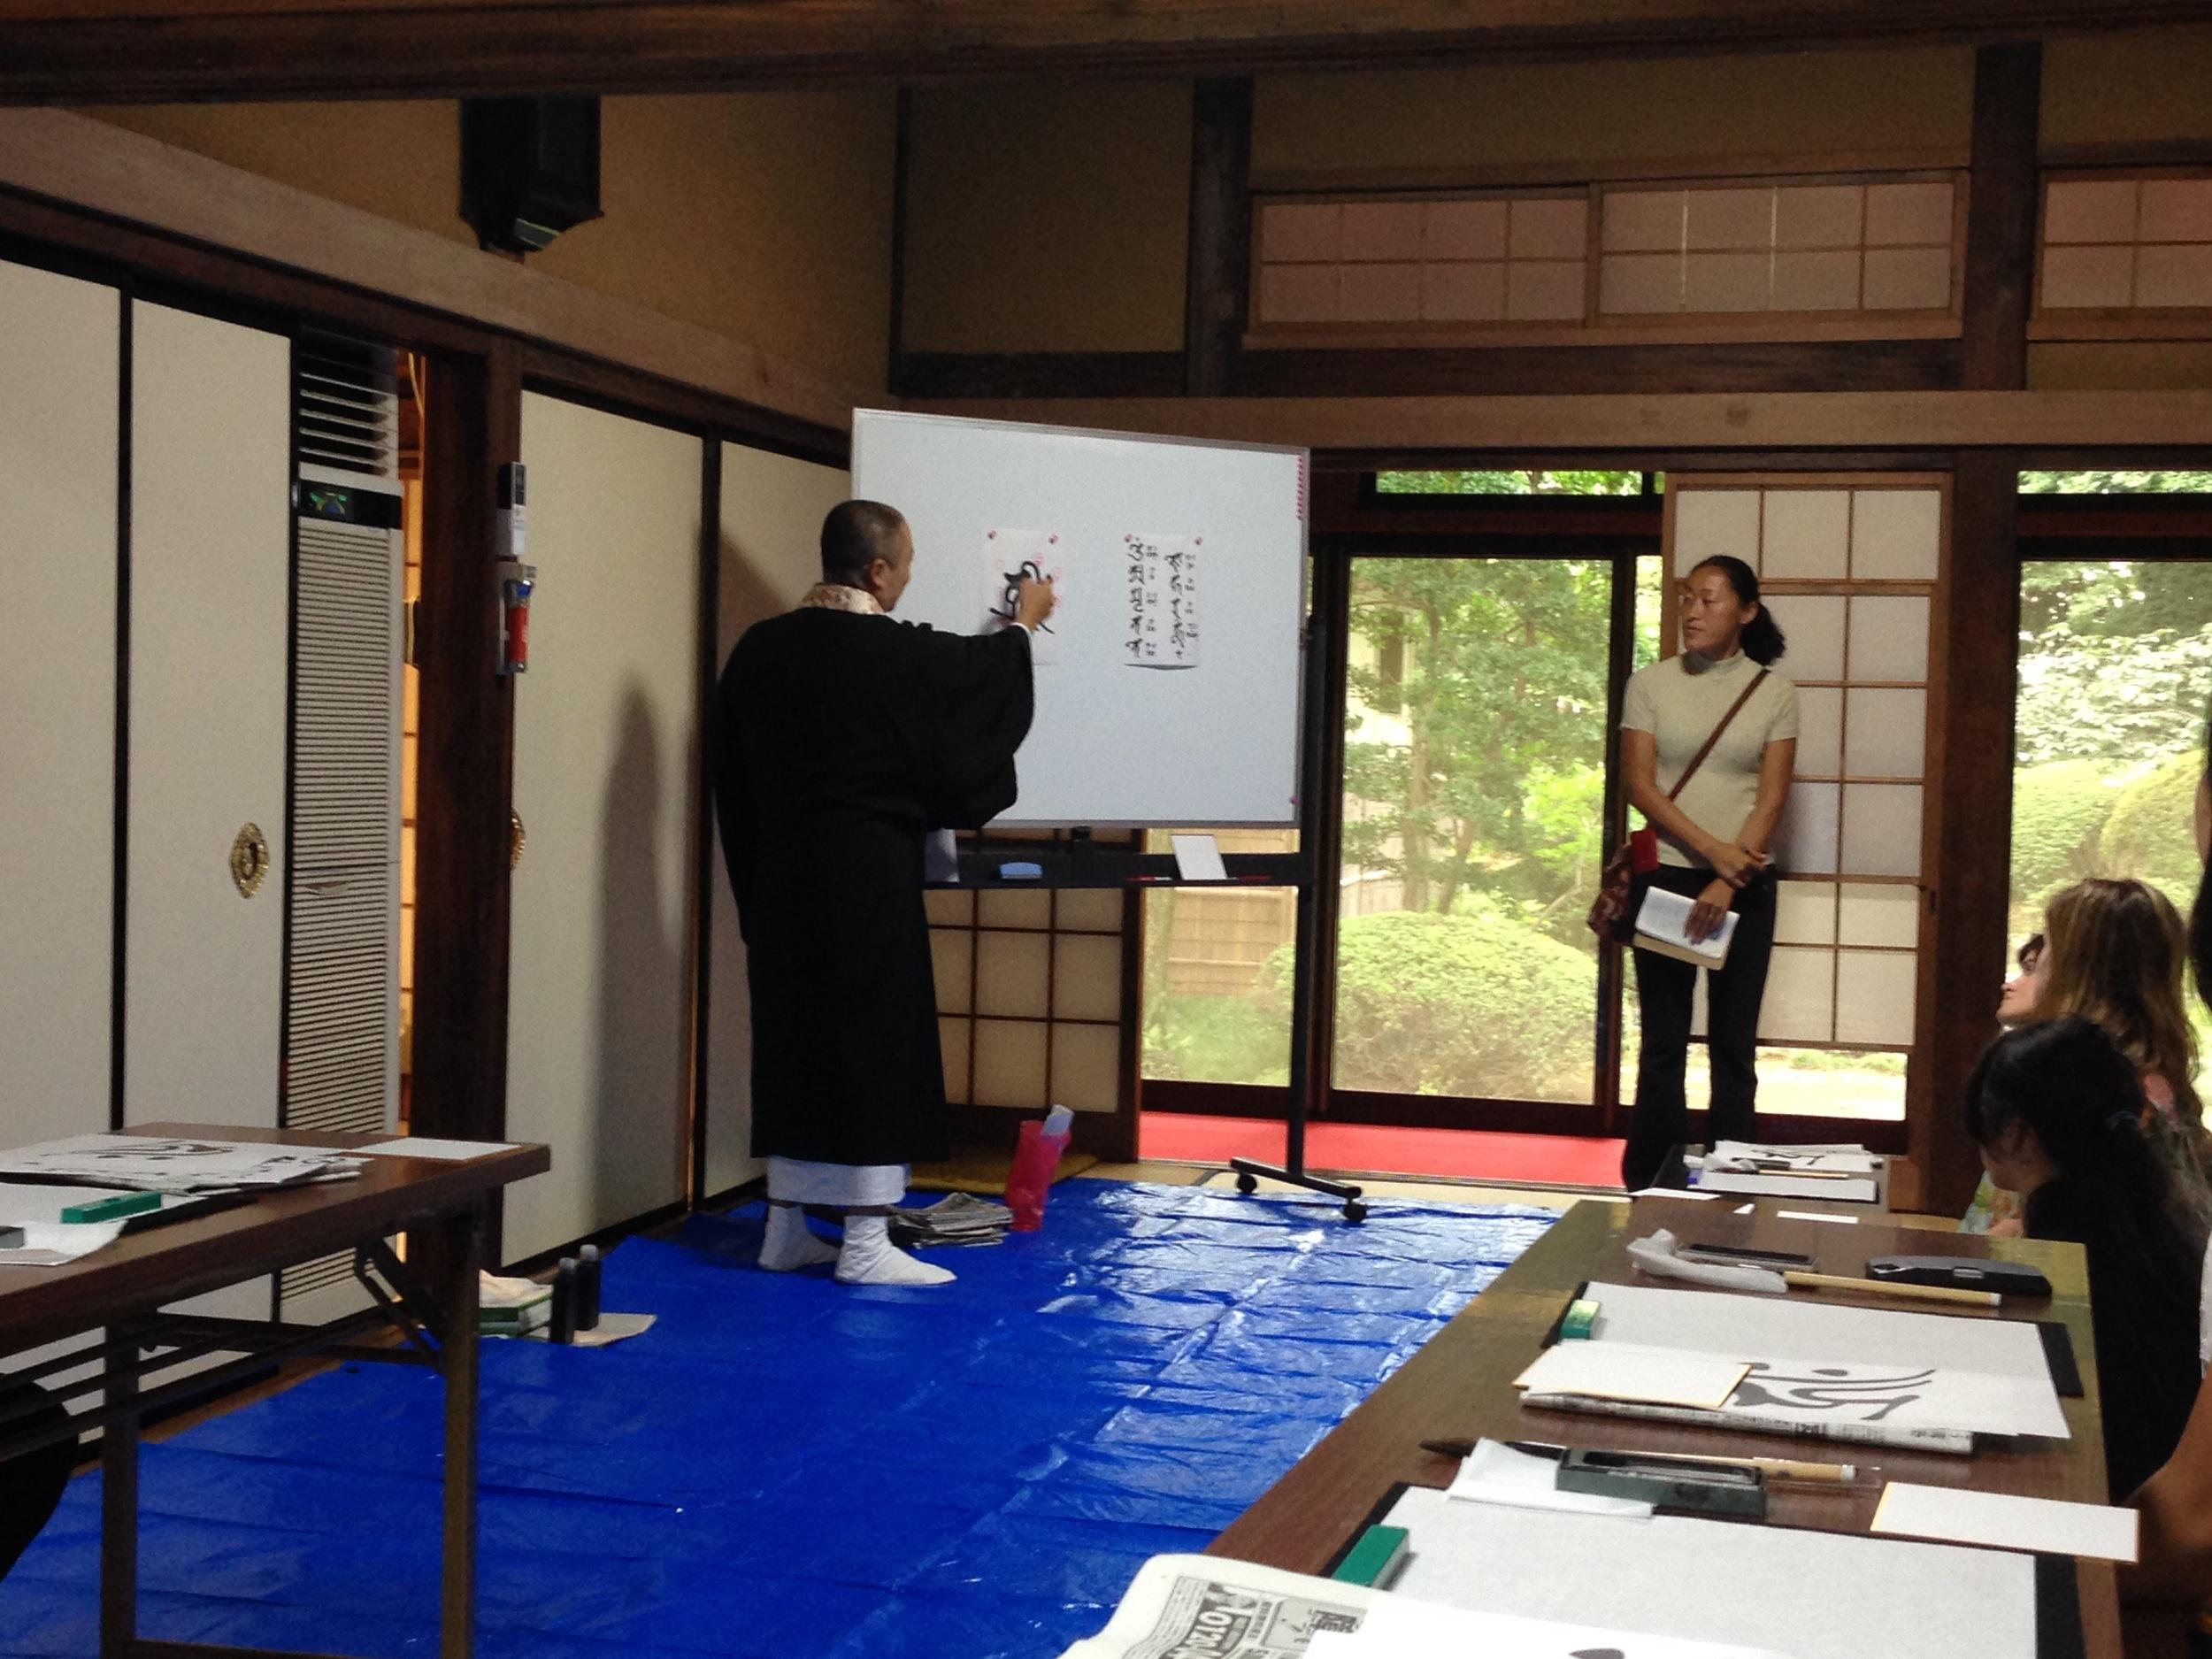 Teaching us calligraphy.